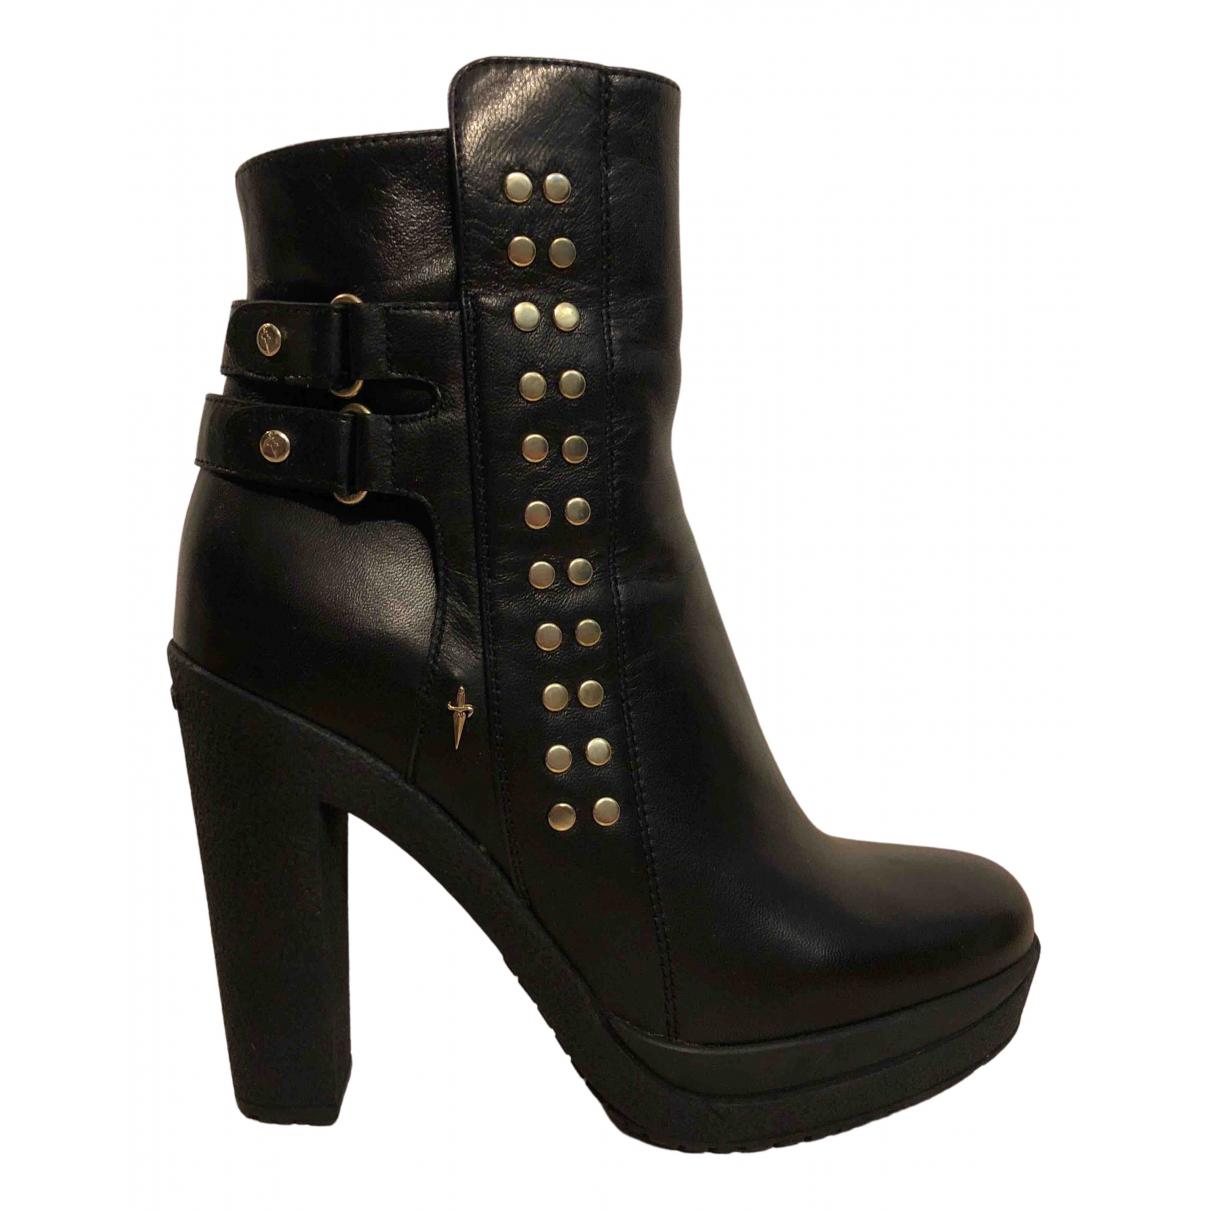 Cesare Paciotti N Black Leather Ankle boots for Women 37 EU